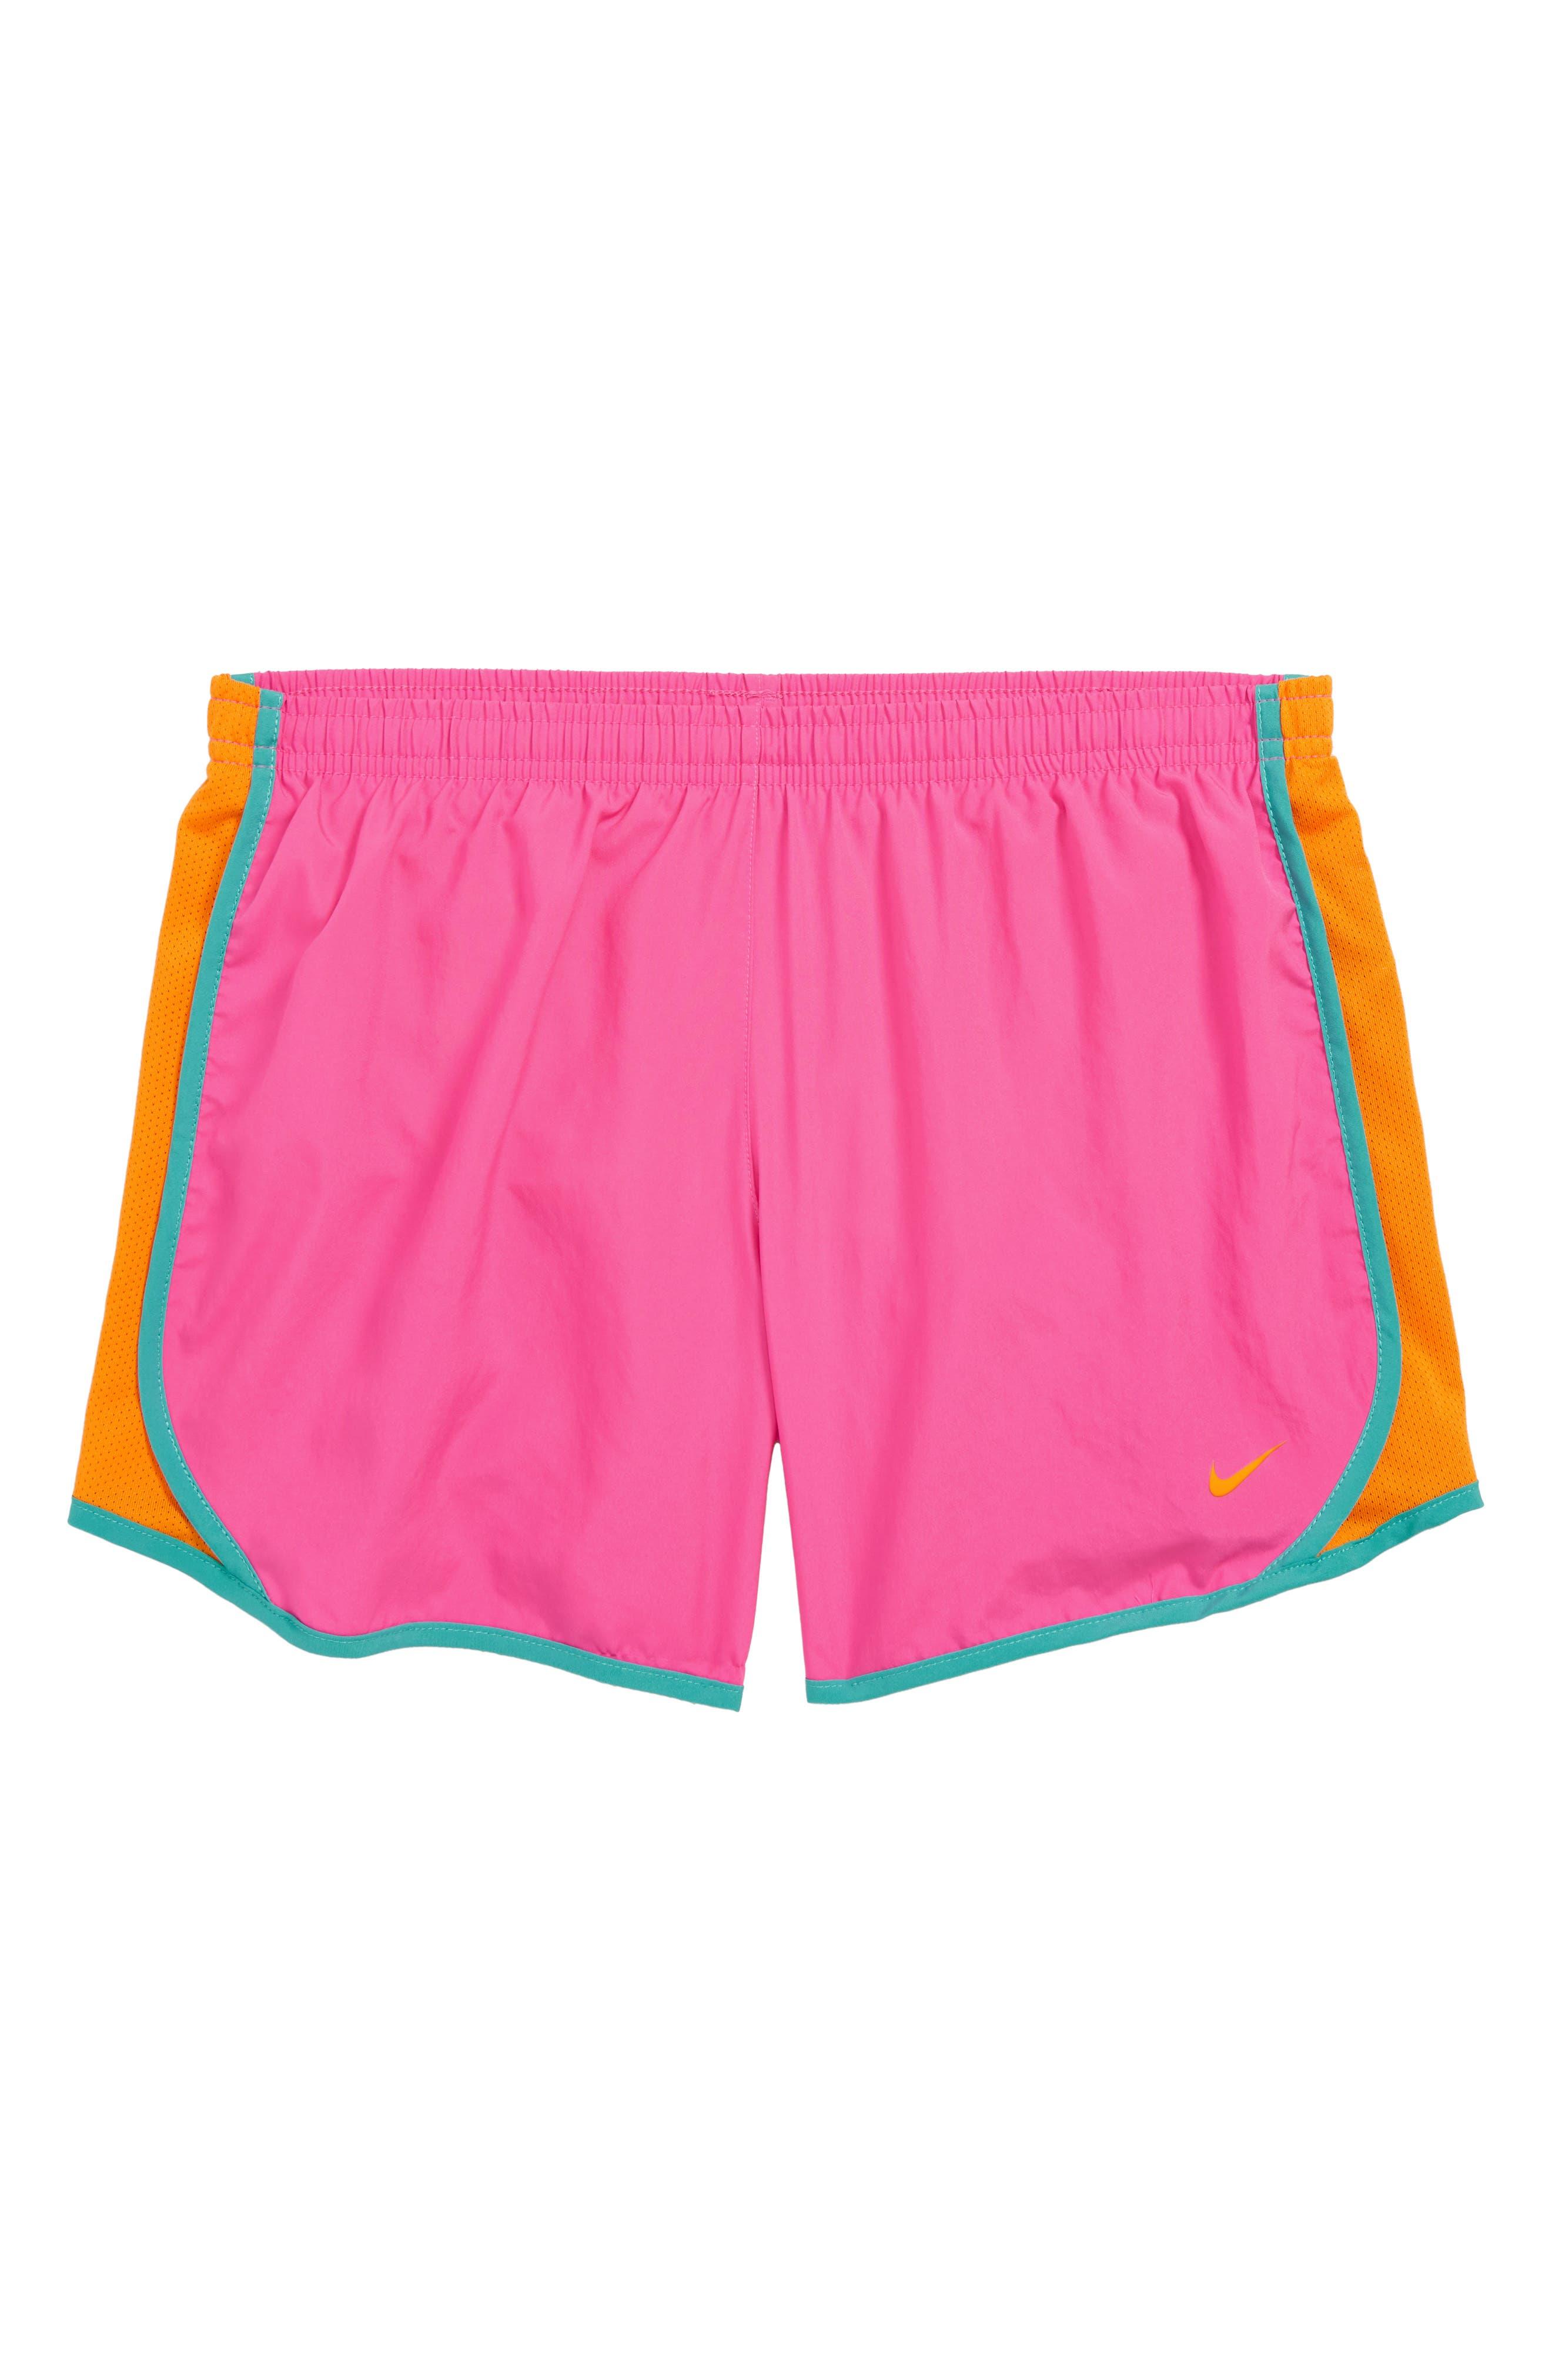 NIKE Dry Tempo Running Shorts, Main, color, LASER FUCHSIA/ ORANGE PEEL